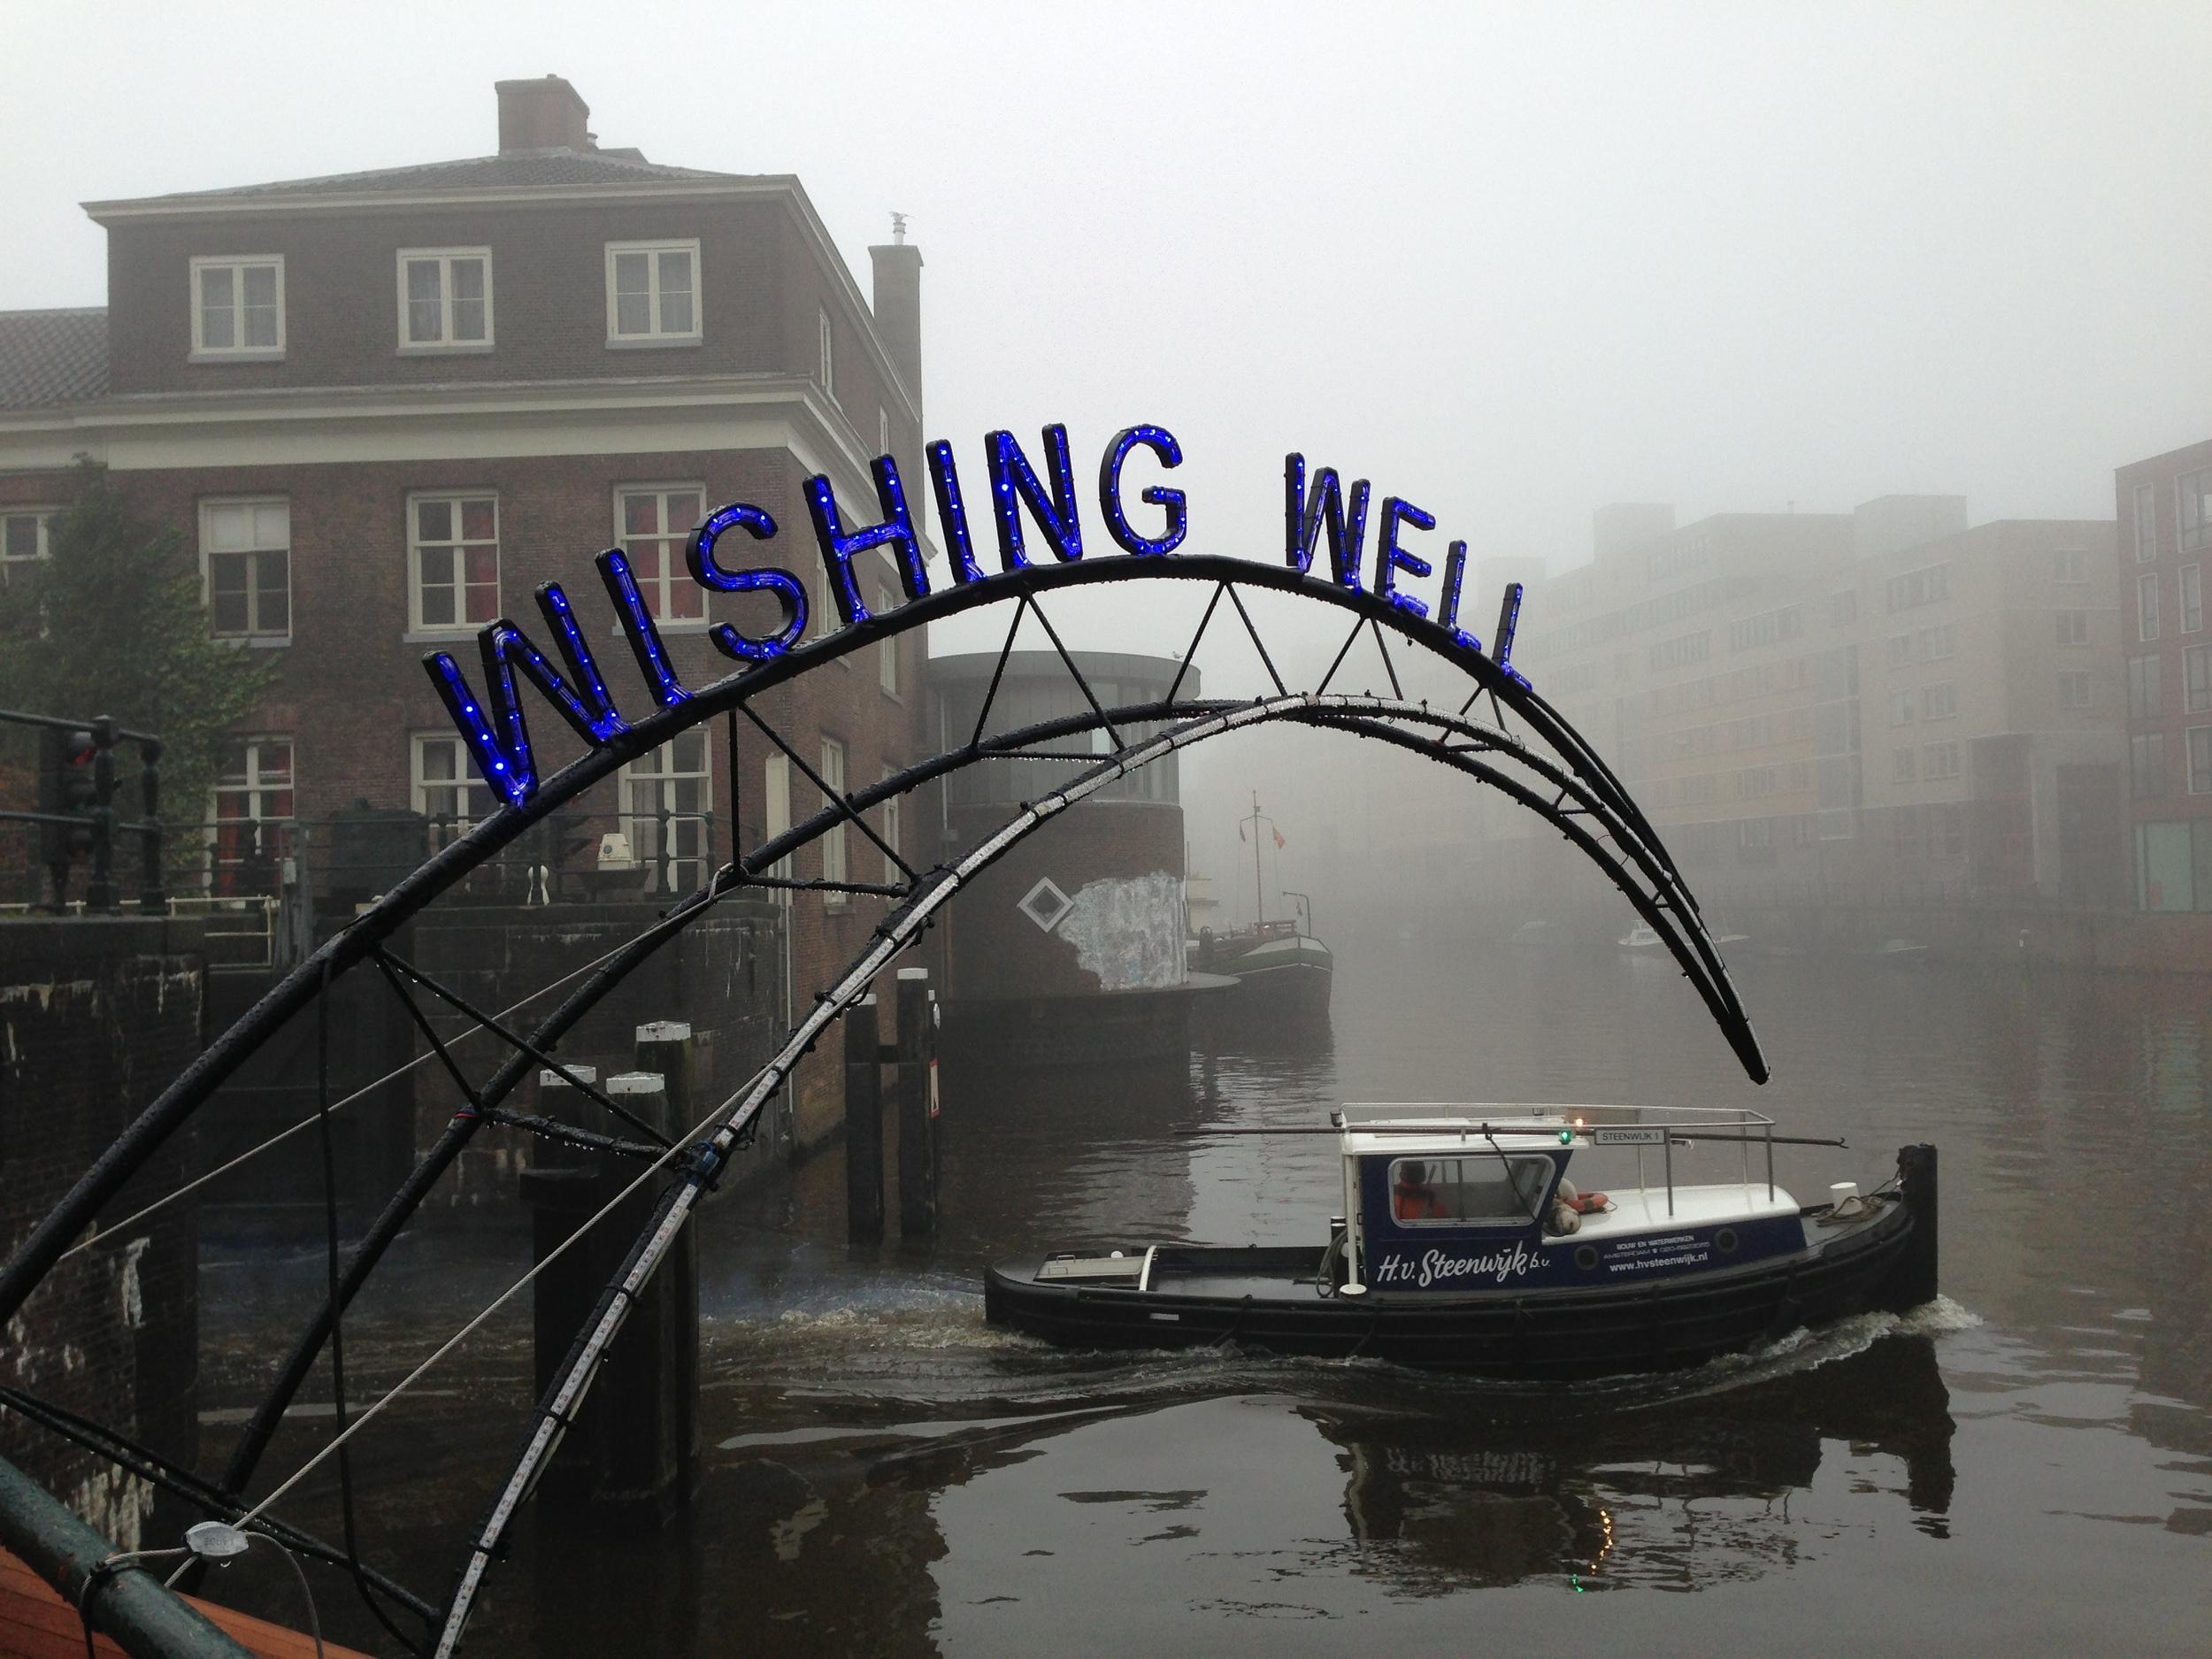 Amsterdam, Wishing Well, une installation du festival de lumières